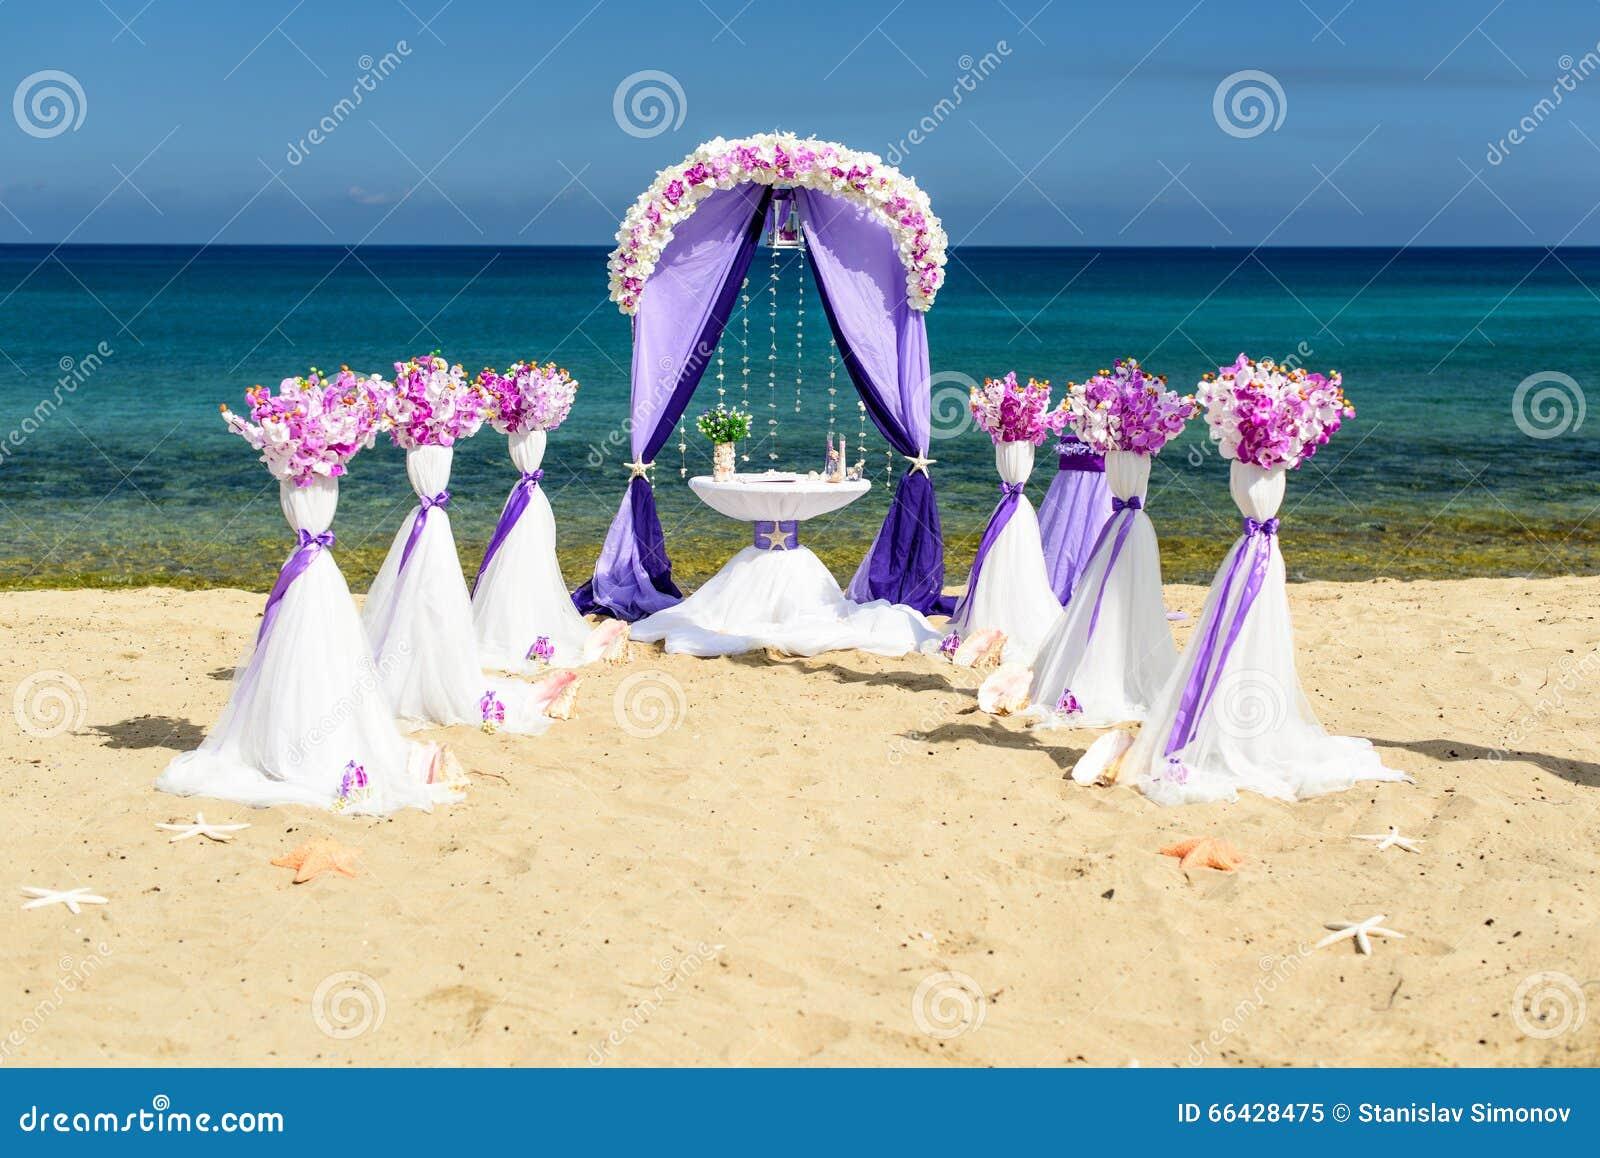 Ocean Wedding Decoration Ideas : Decorations weddings ocean set accessories wedding shores caribbean